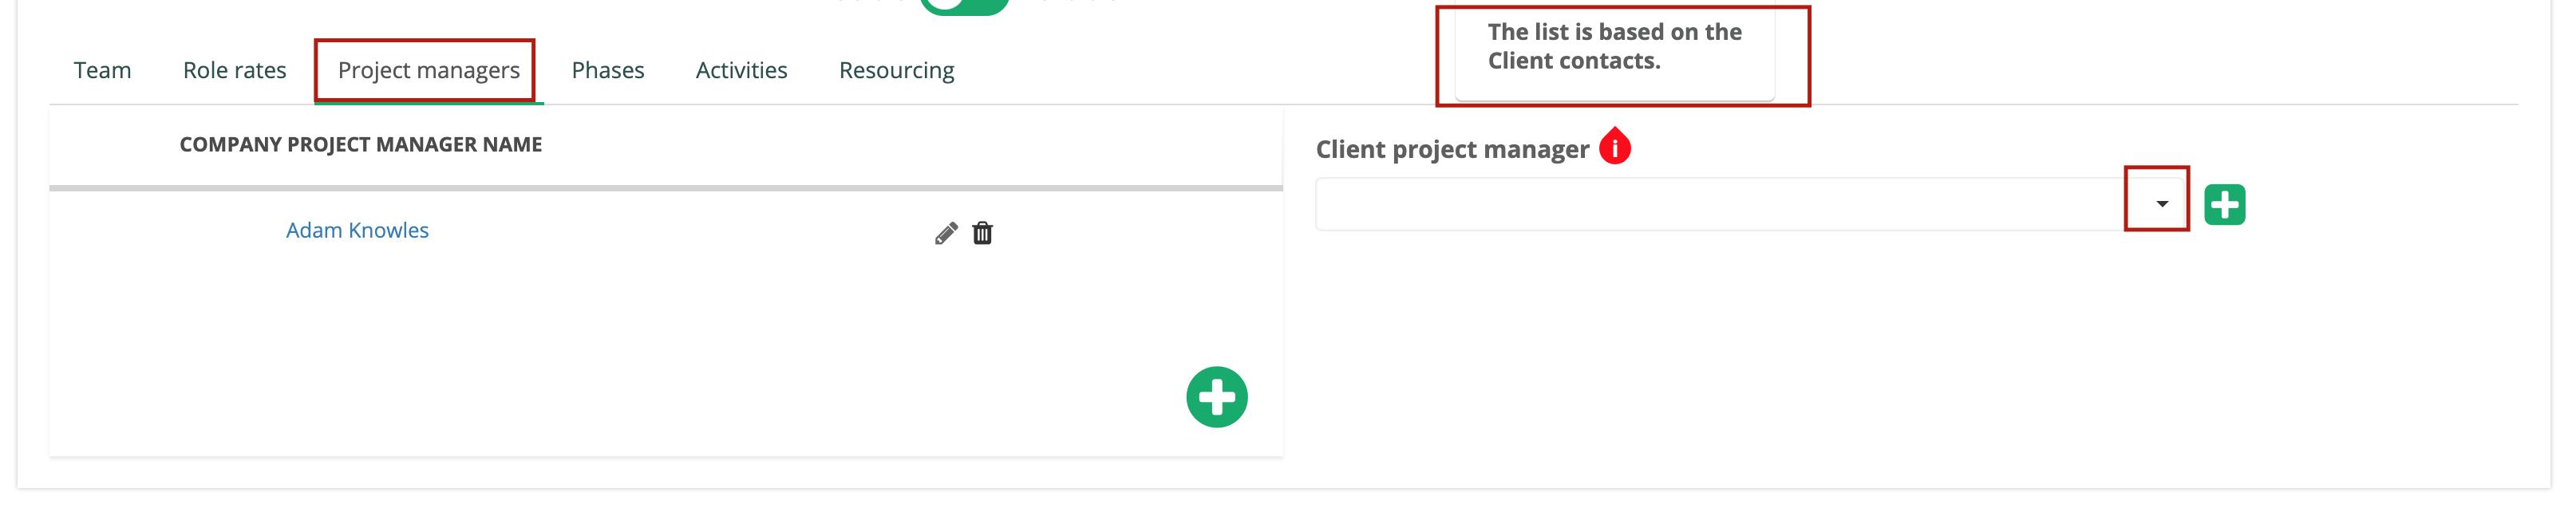 Add Client PM